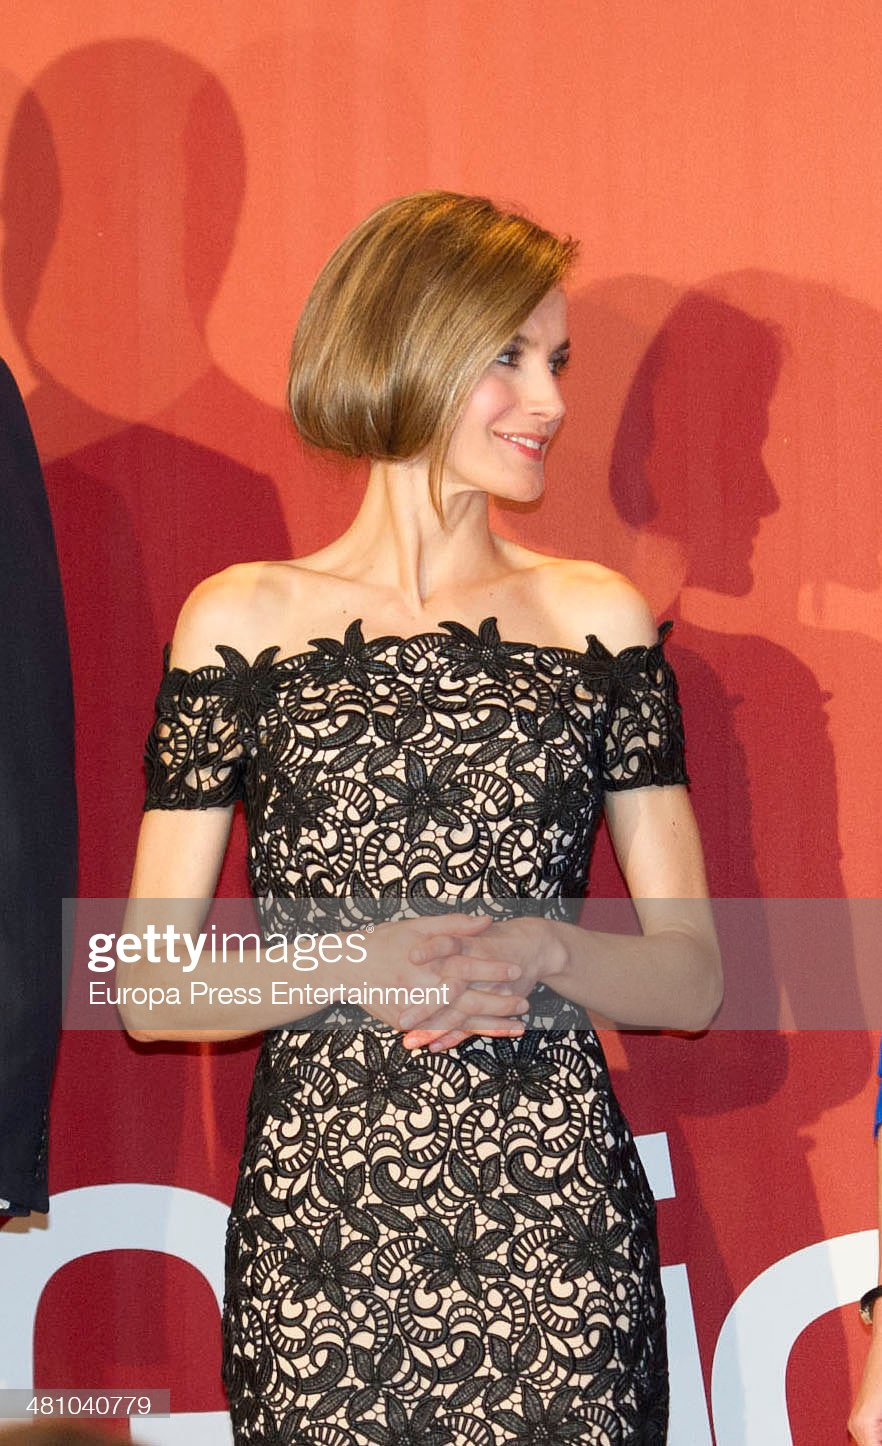 Вечерние наряды Королевы Летиции Spanish Royals Attend 'XIV Young Businessman National Award' : News Photo